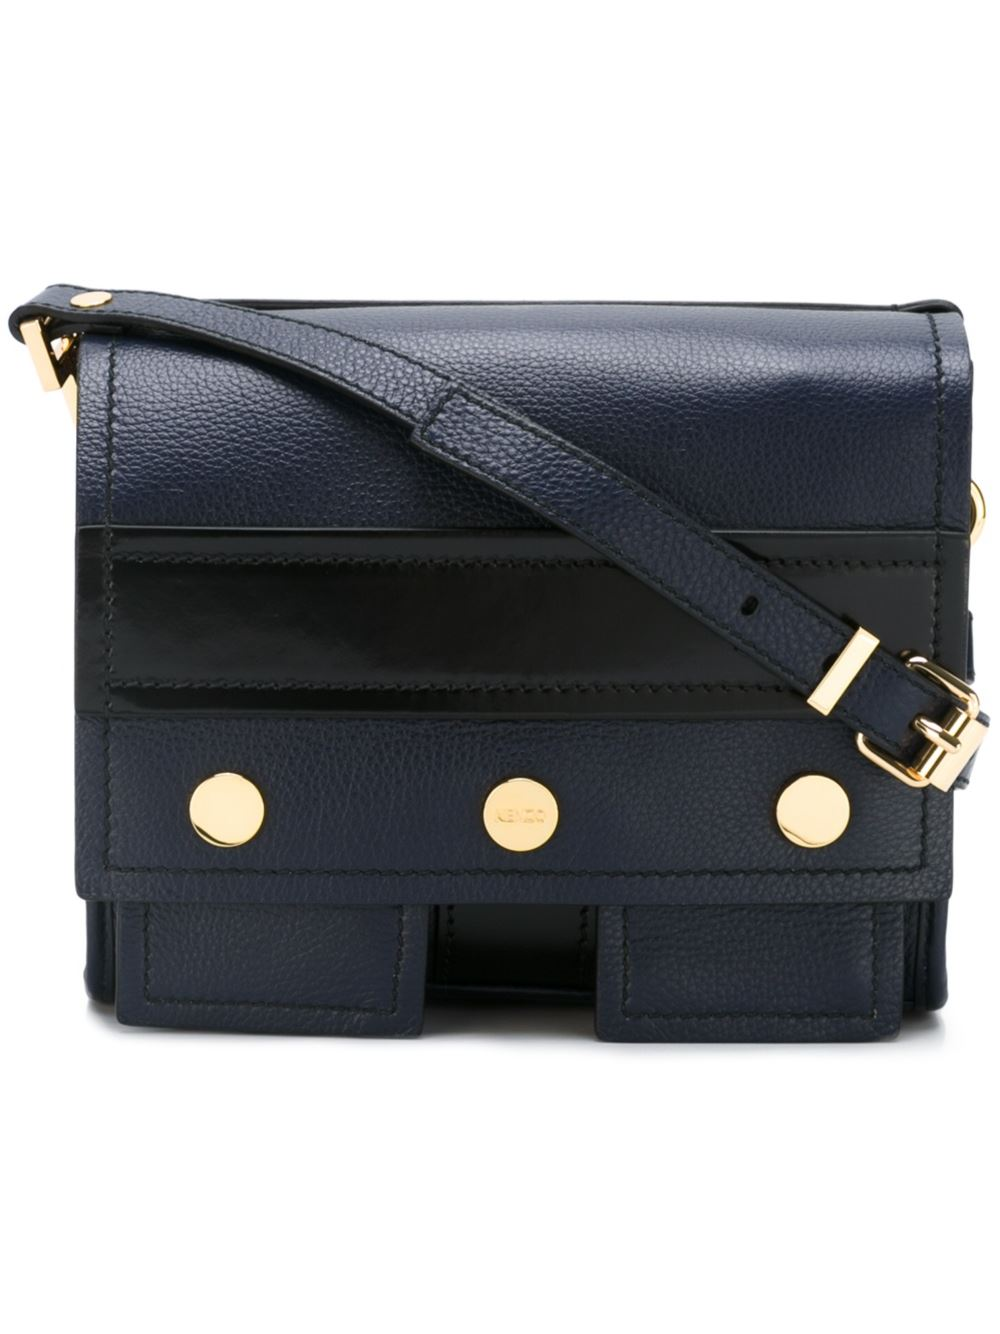 2448444923f9 Kenzo sac porté épaule